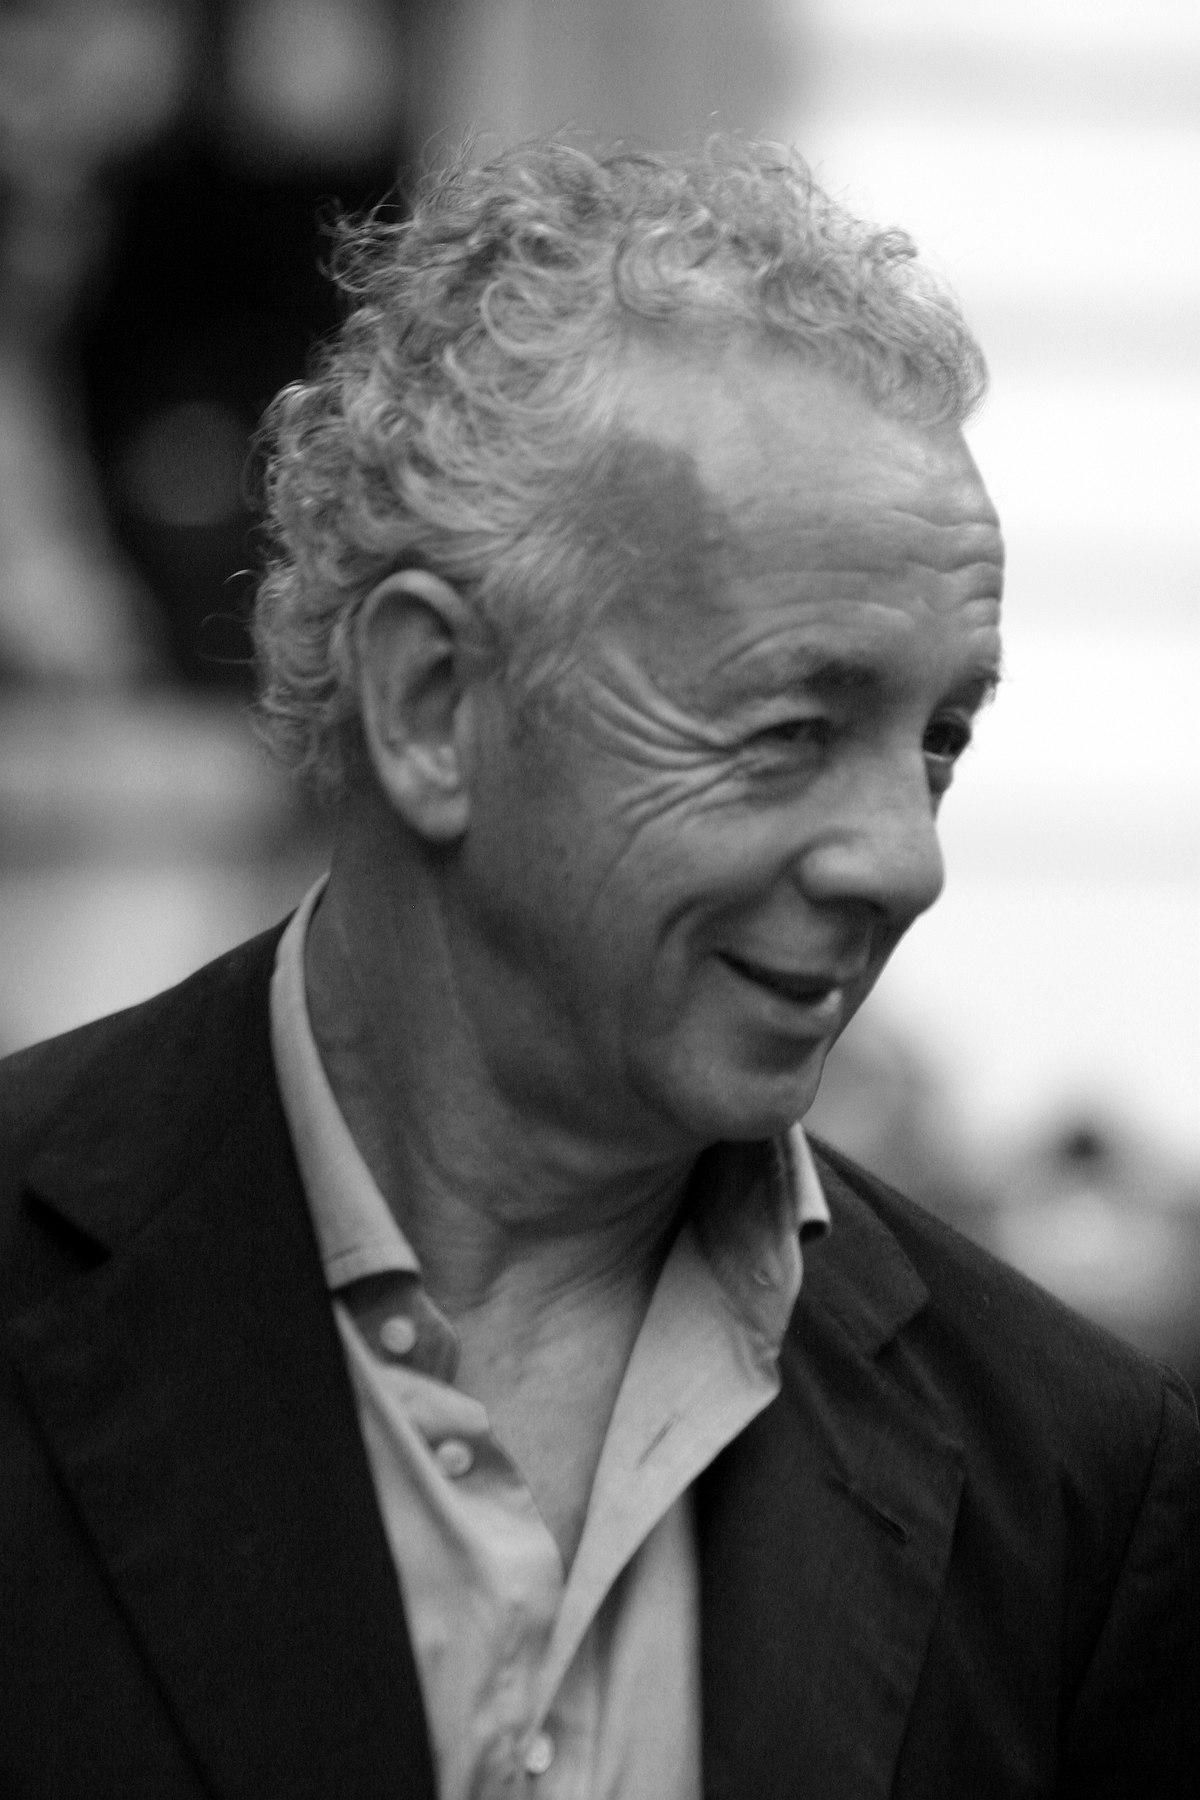 Gilles bemsimon